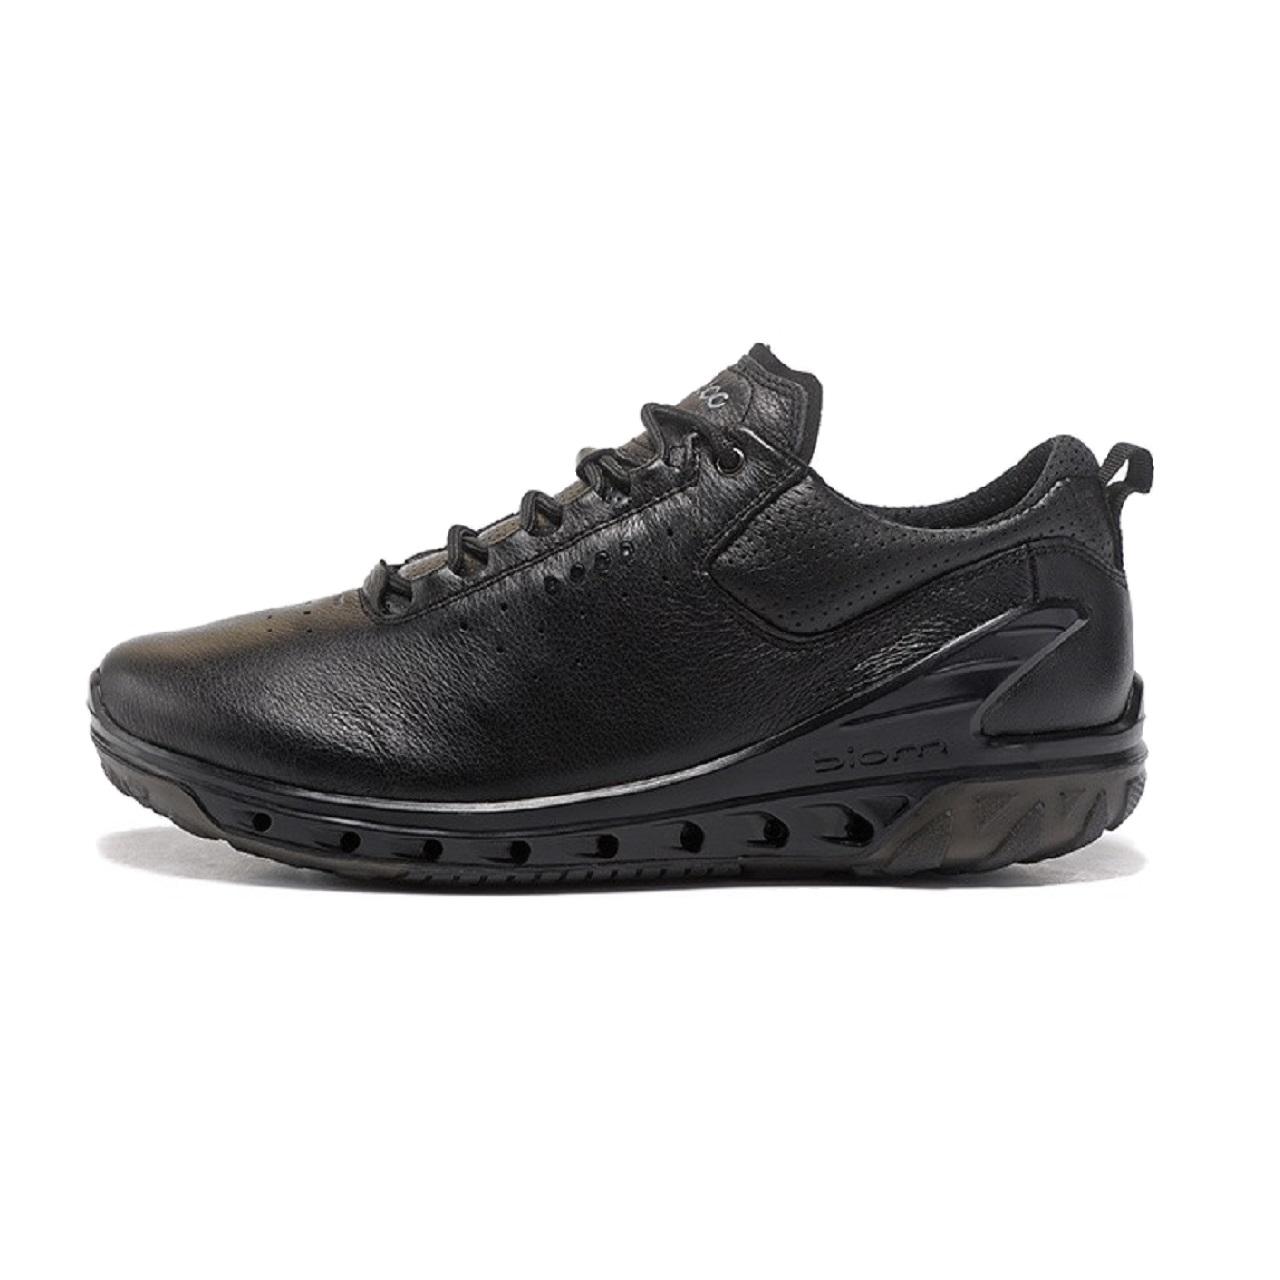 کفش مردانه اکو مدل 820724-01001